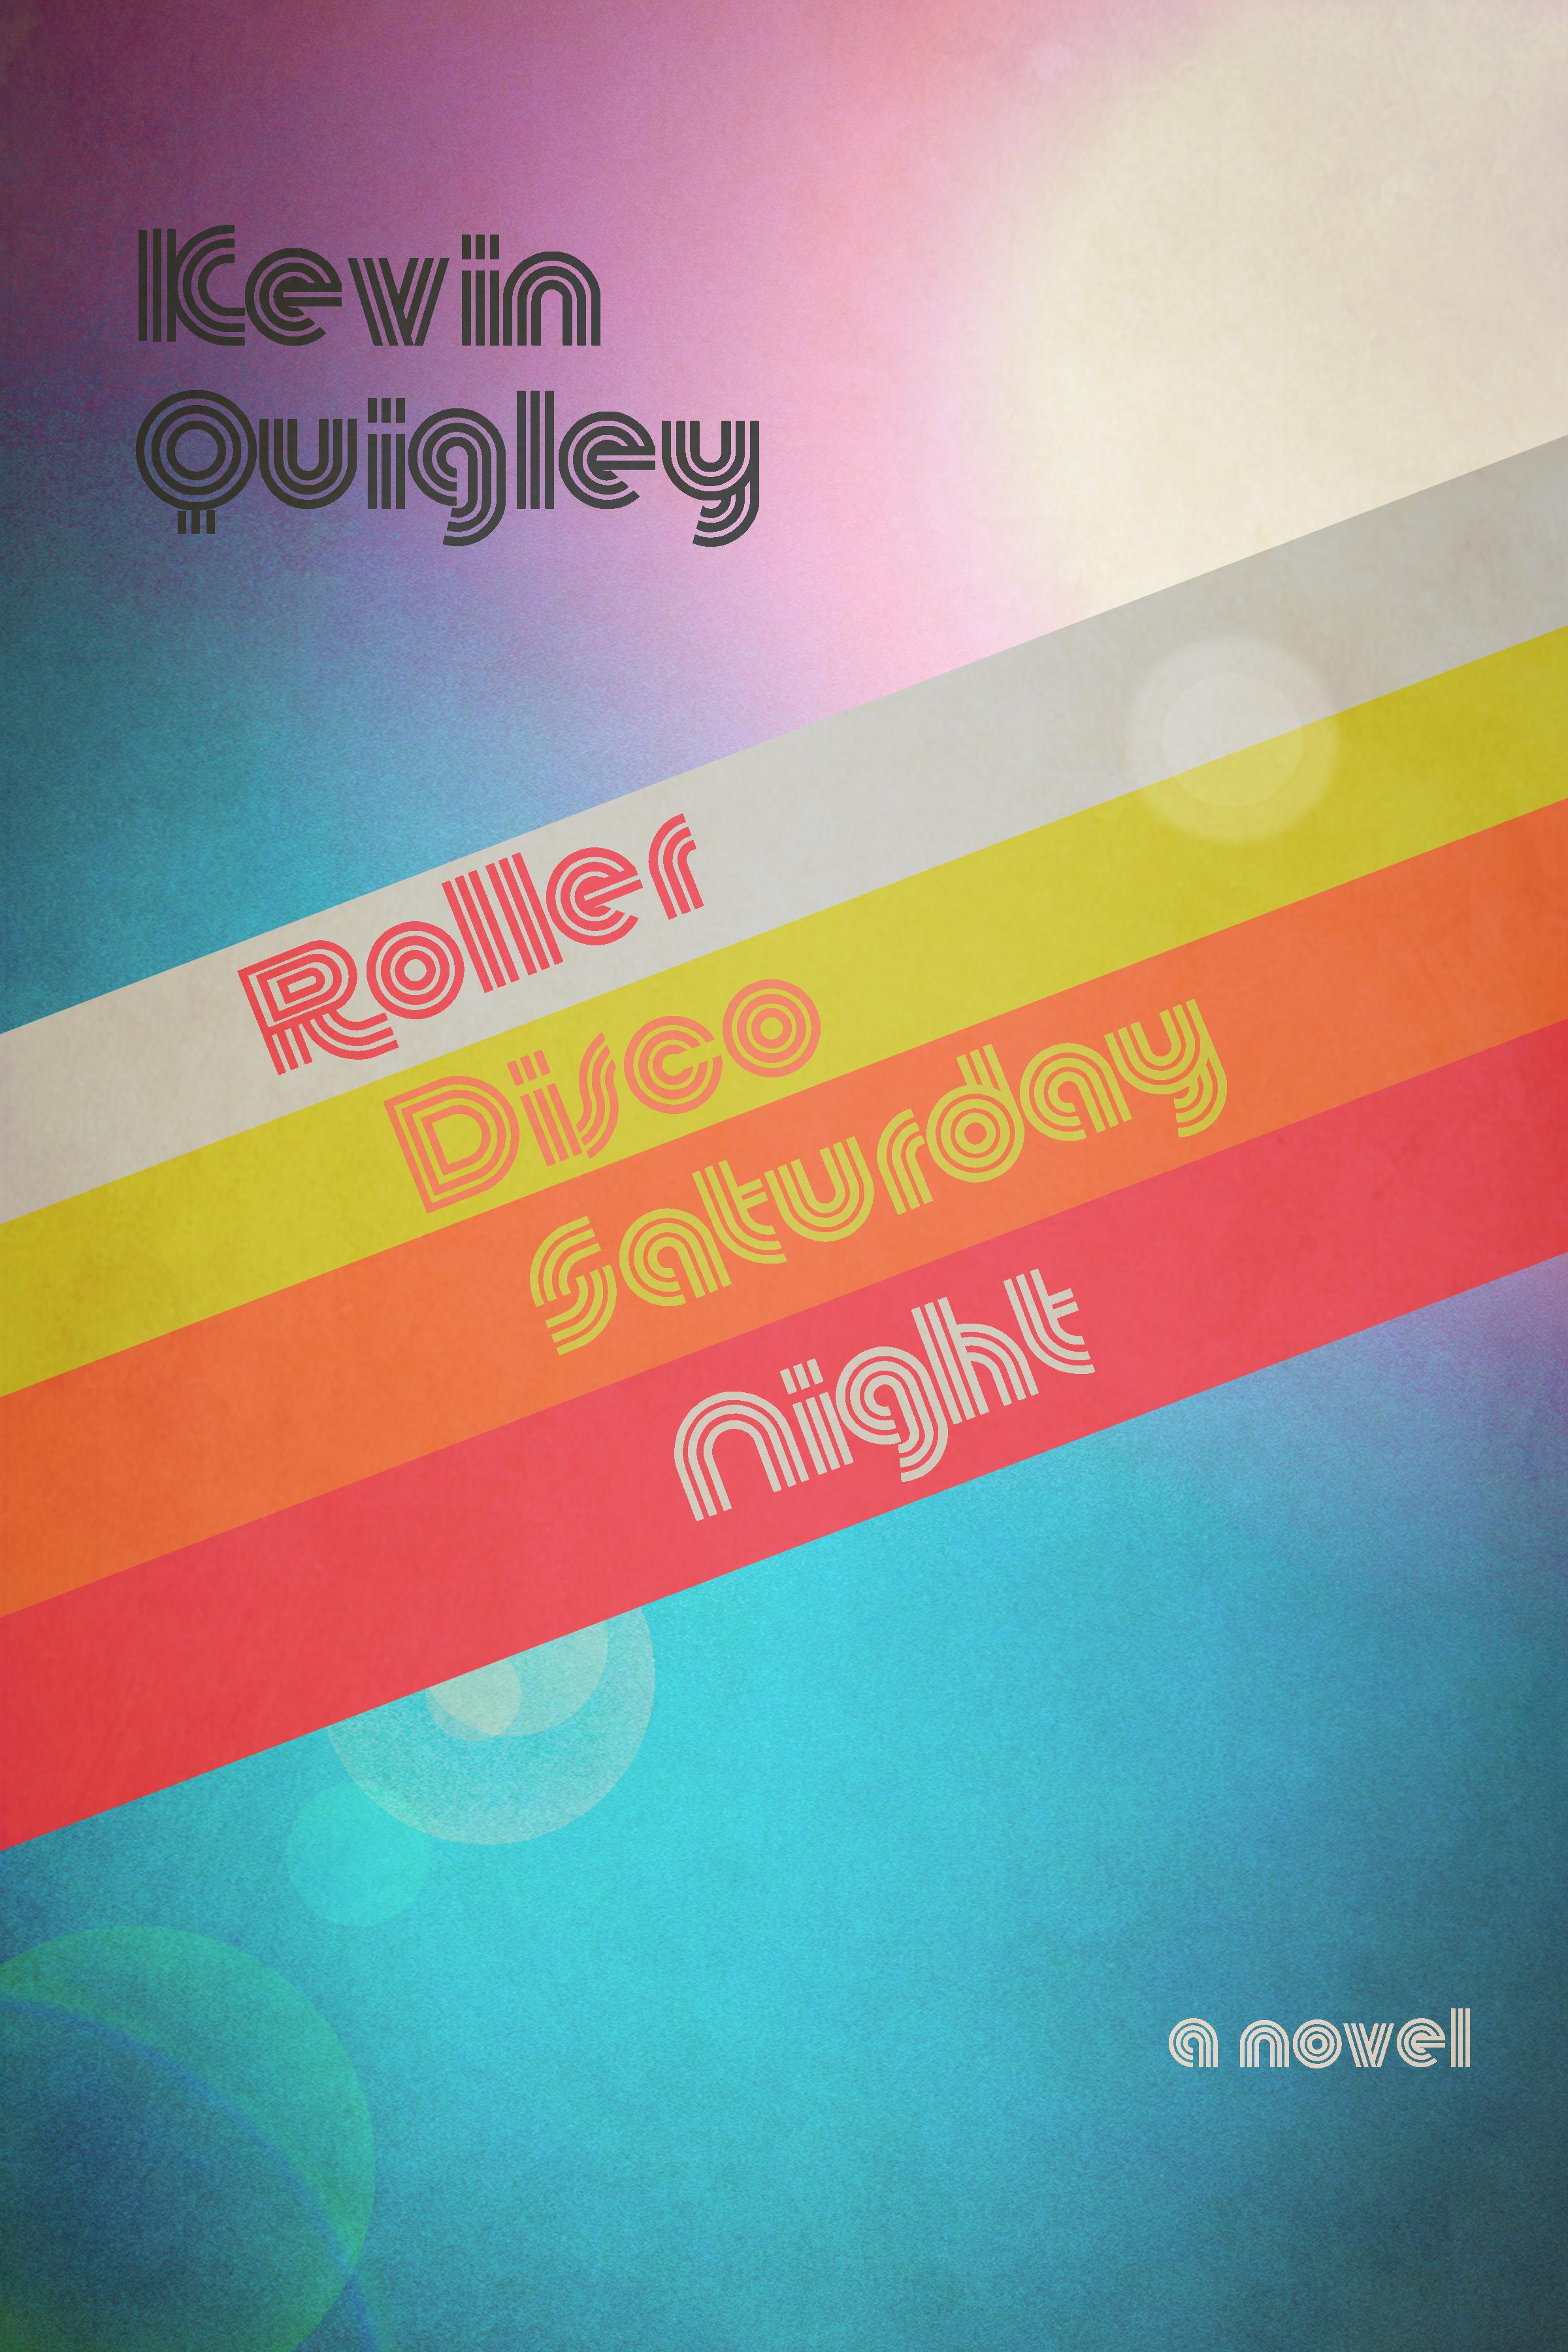 Roller Disco Saturday Night.jpg